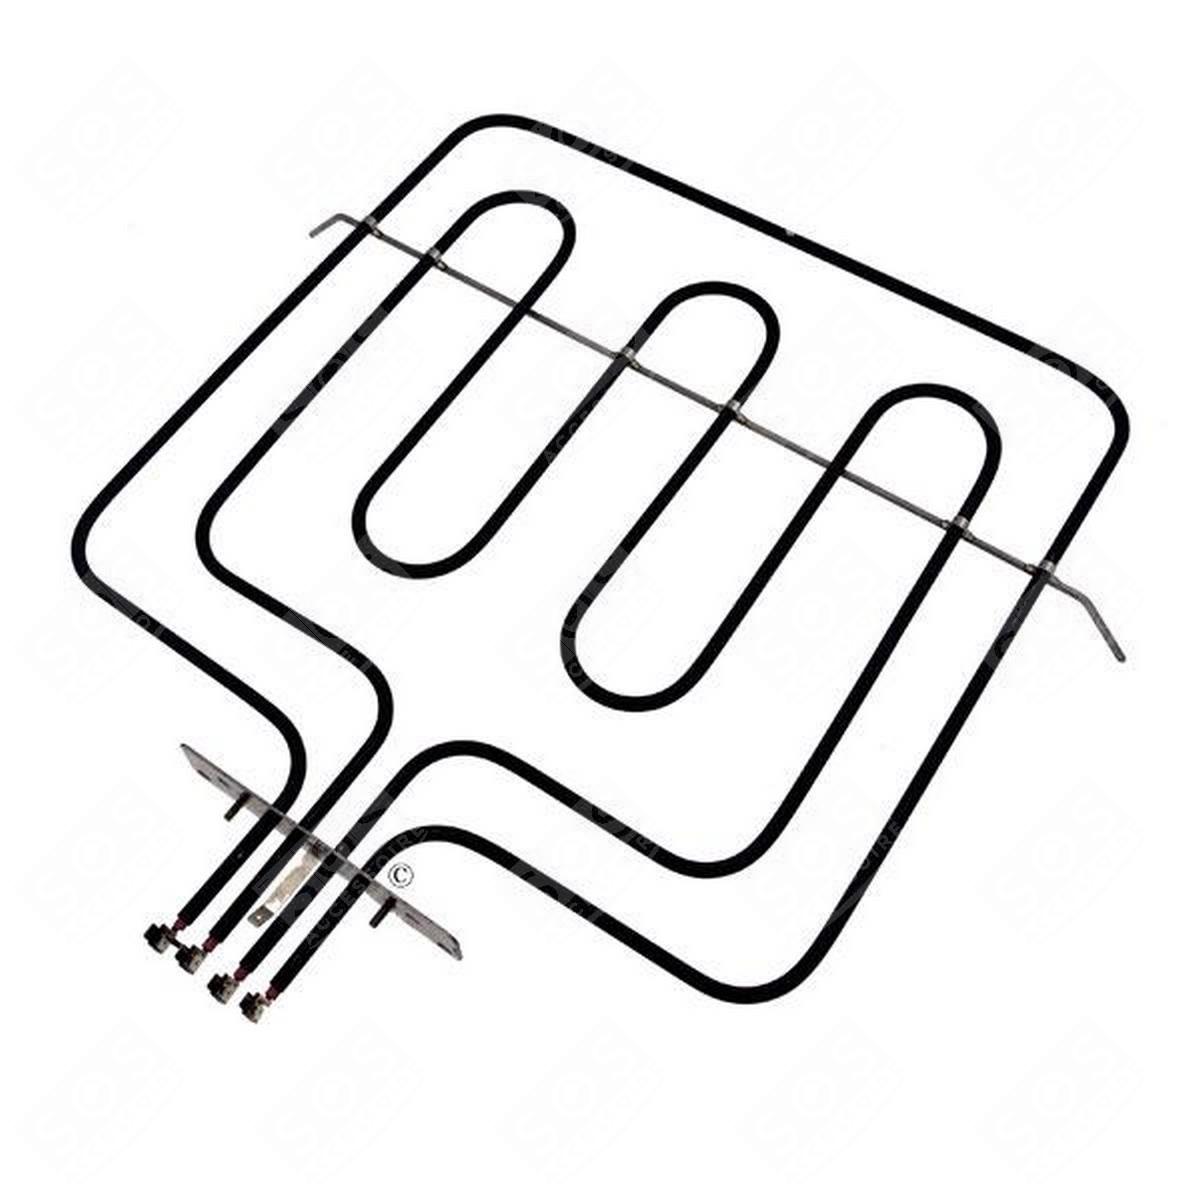 1 800w Grill Heating Element Top Brandt Sauter Thomson